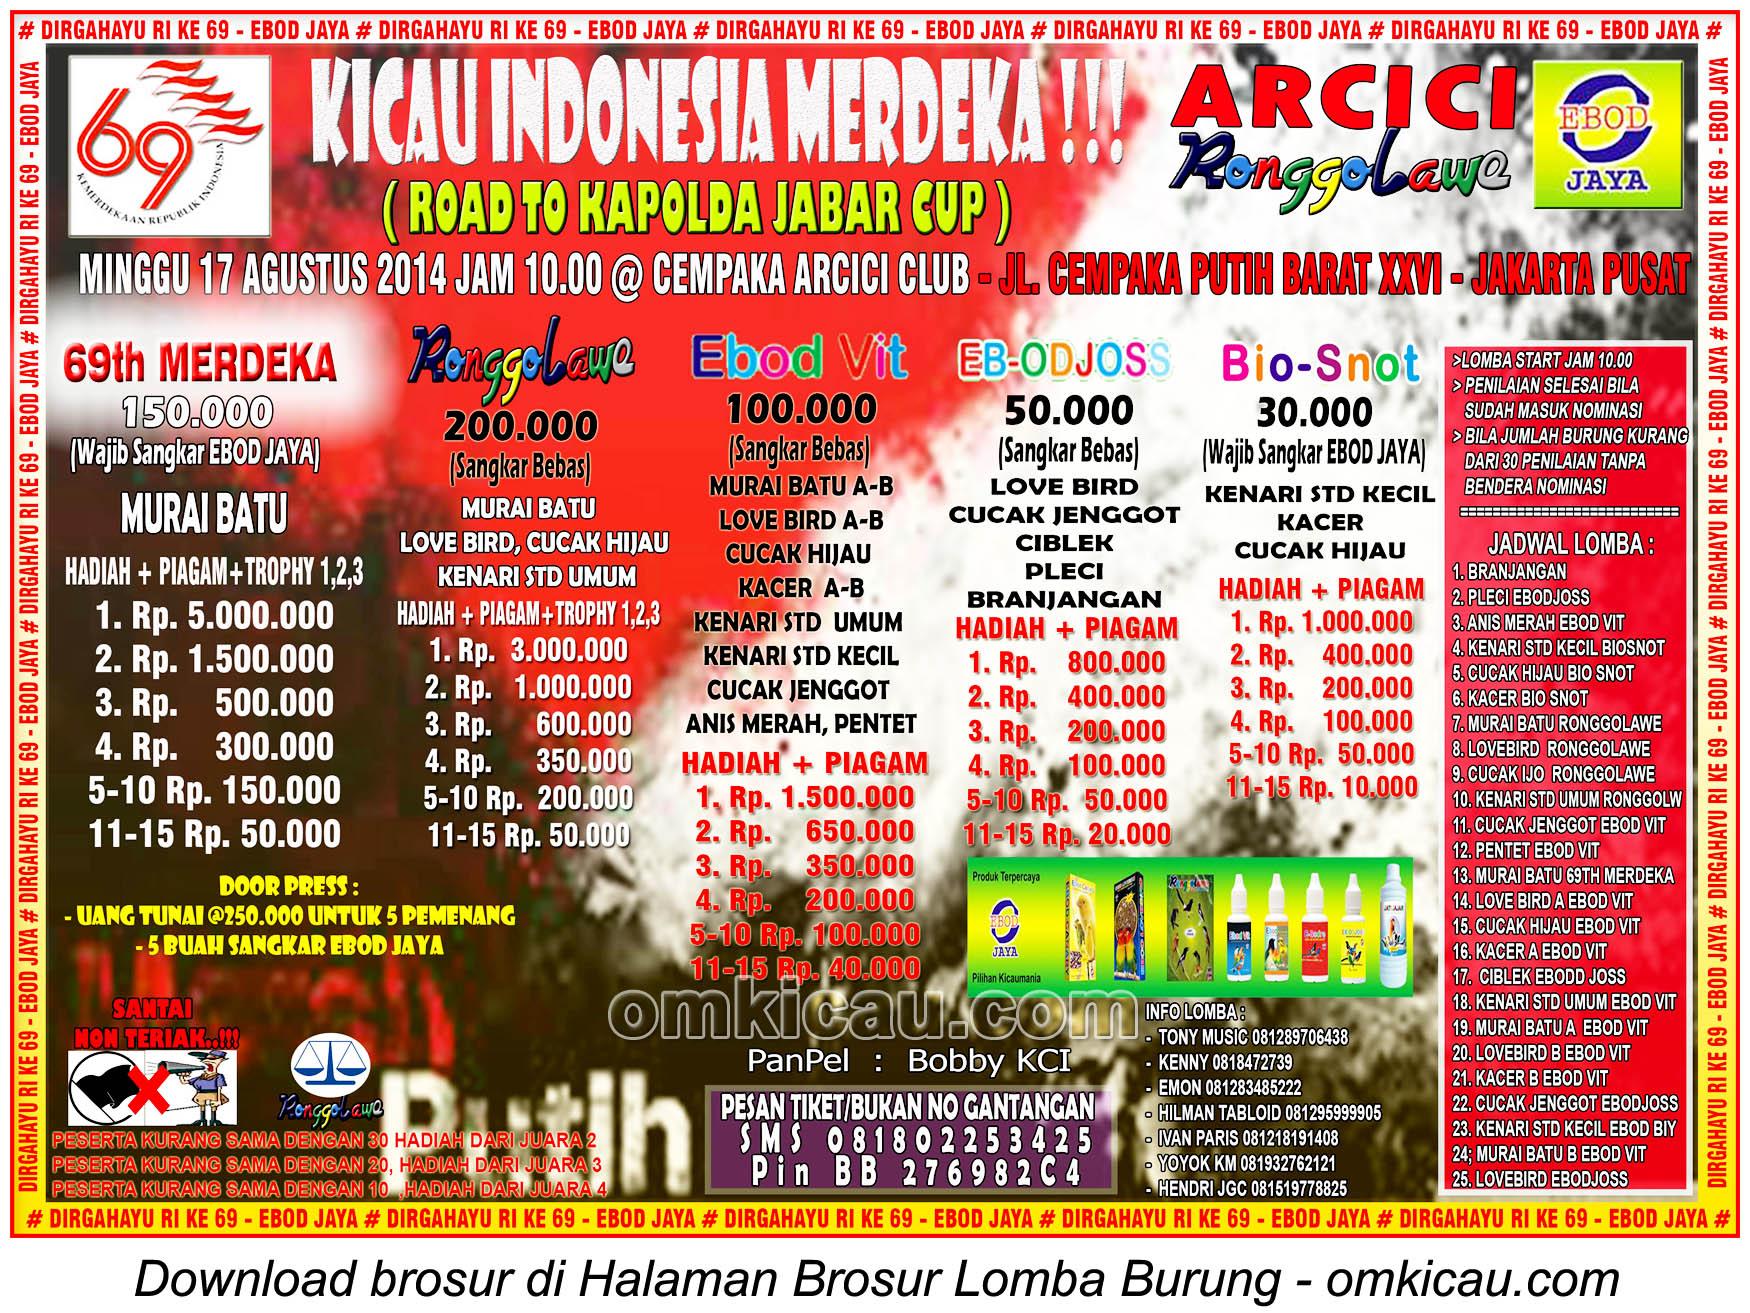 Brosur Lomba Burung Kicau Indonesia Merdeka - Arcici, Jakarta Pusat, 17 Agustus 2014